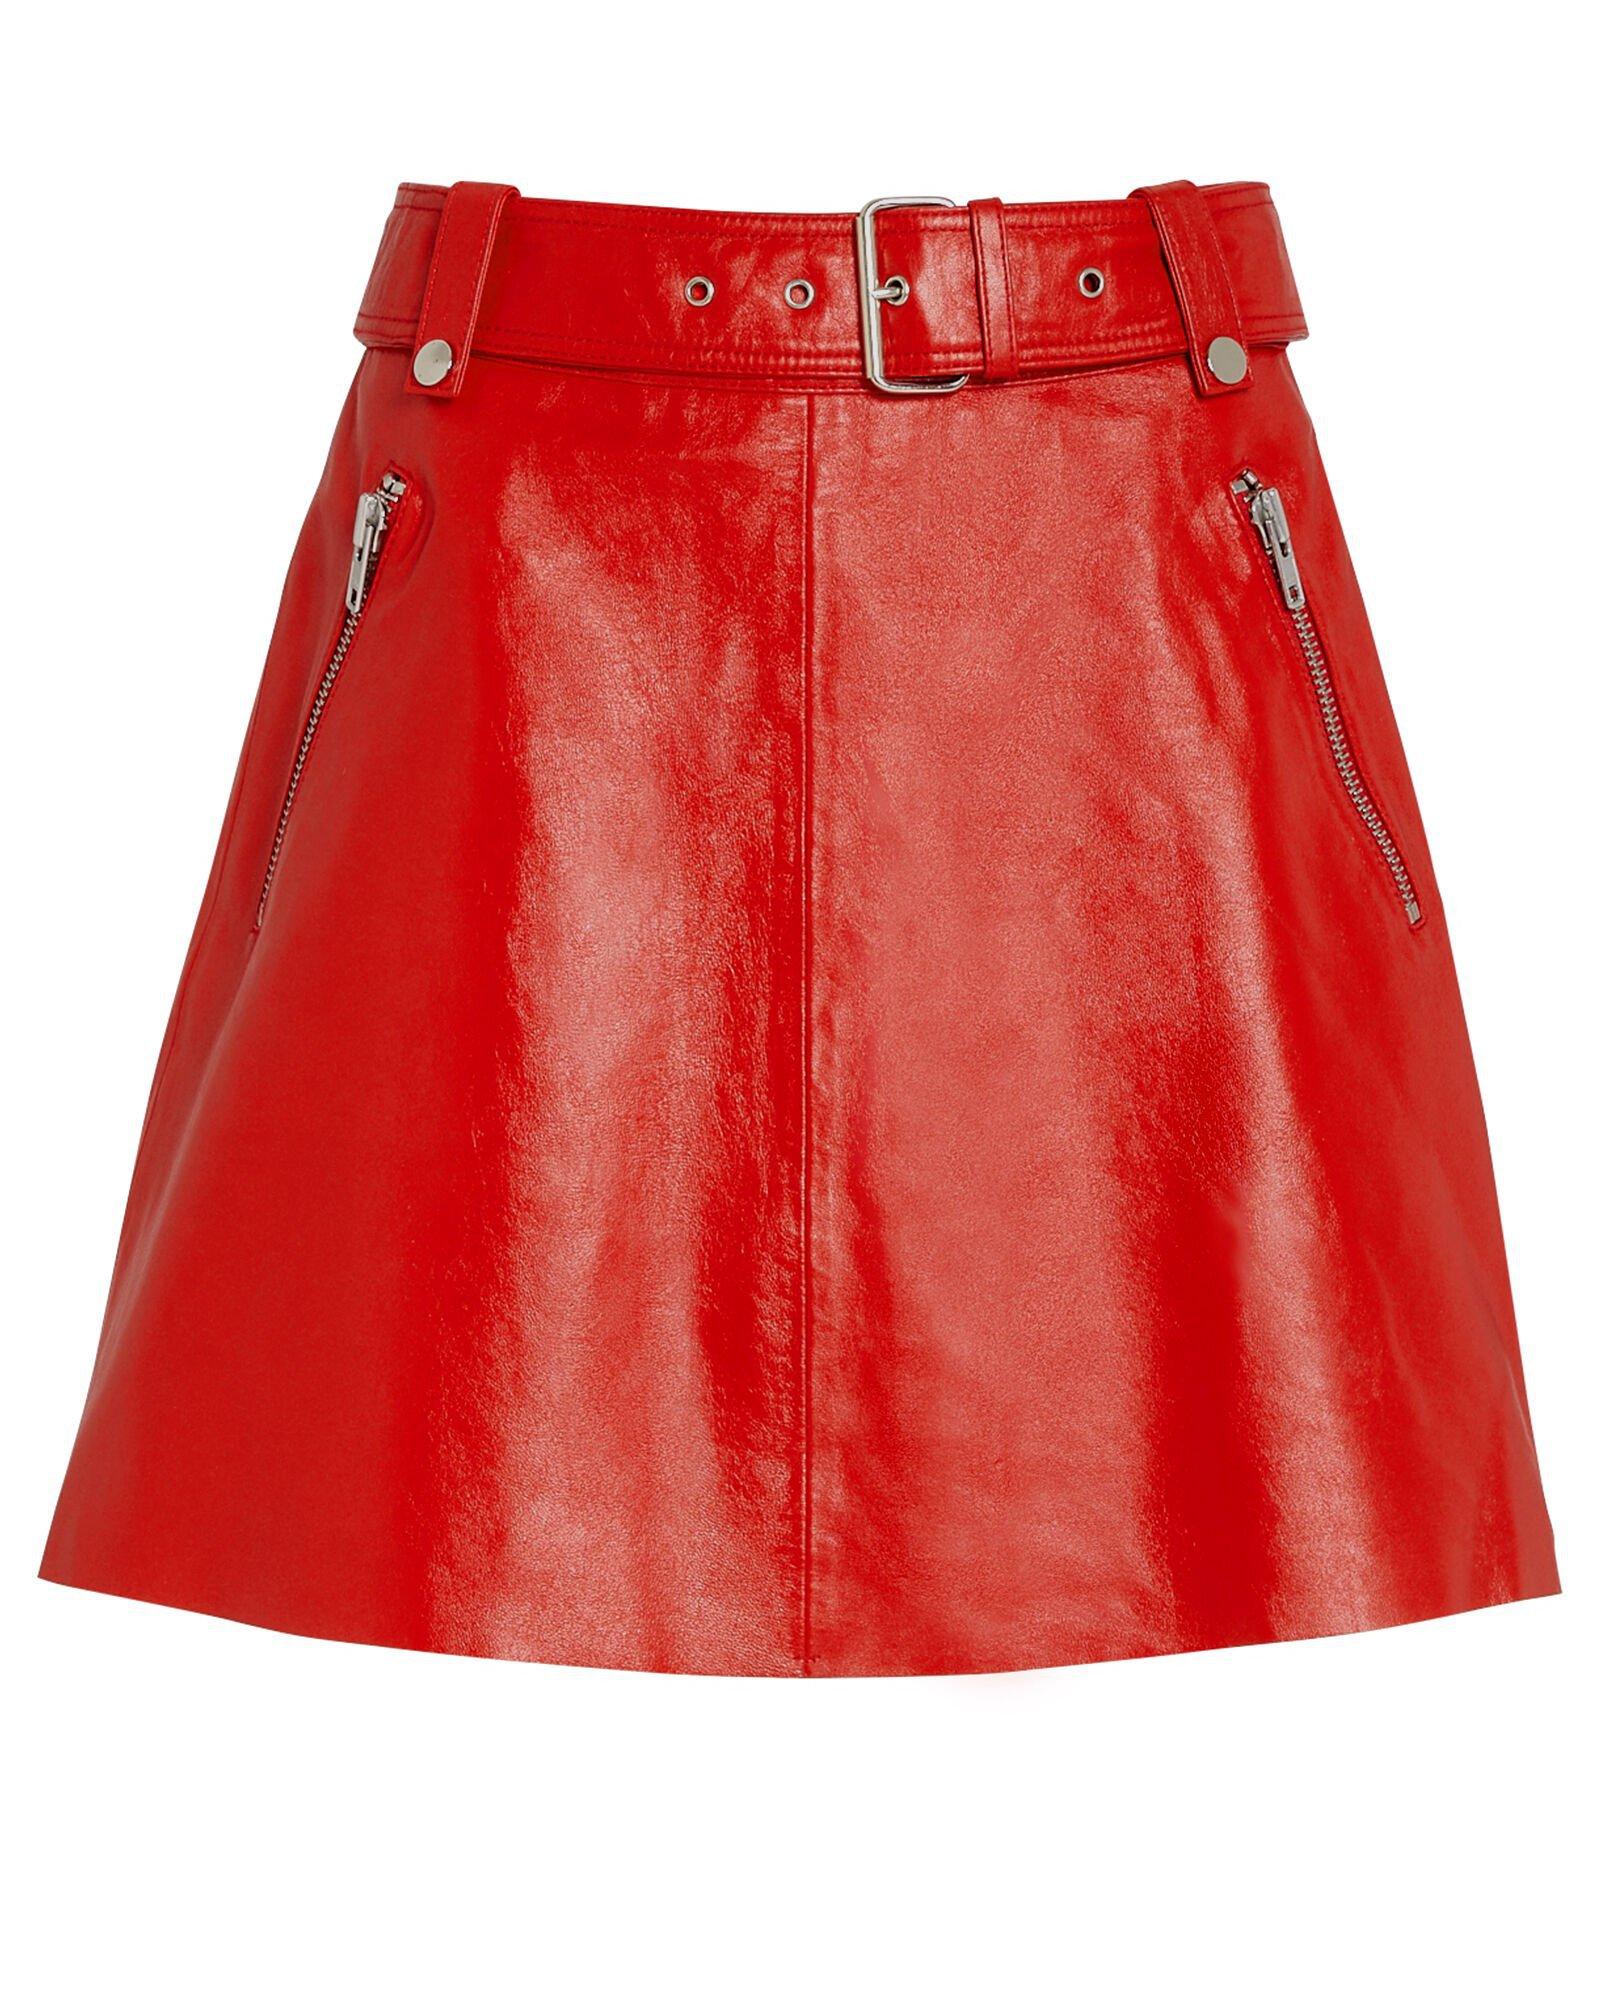 Magnolia Leather Mini Skirt